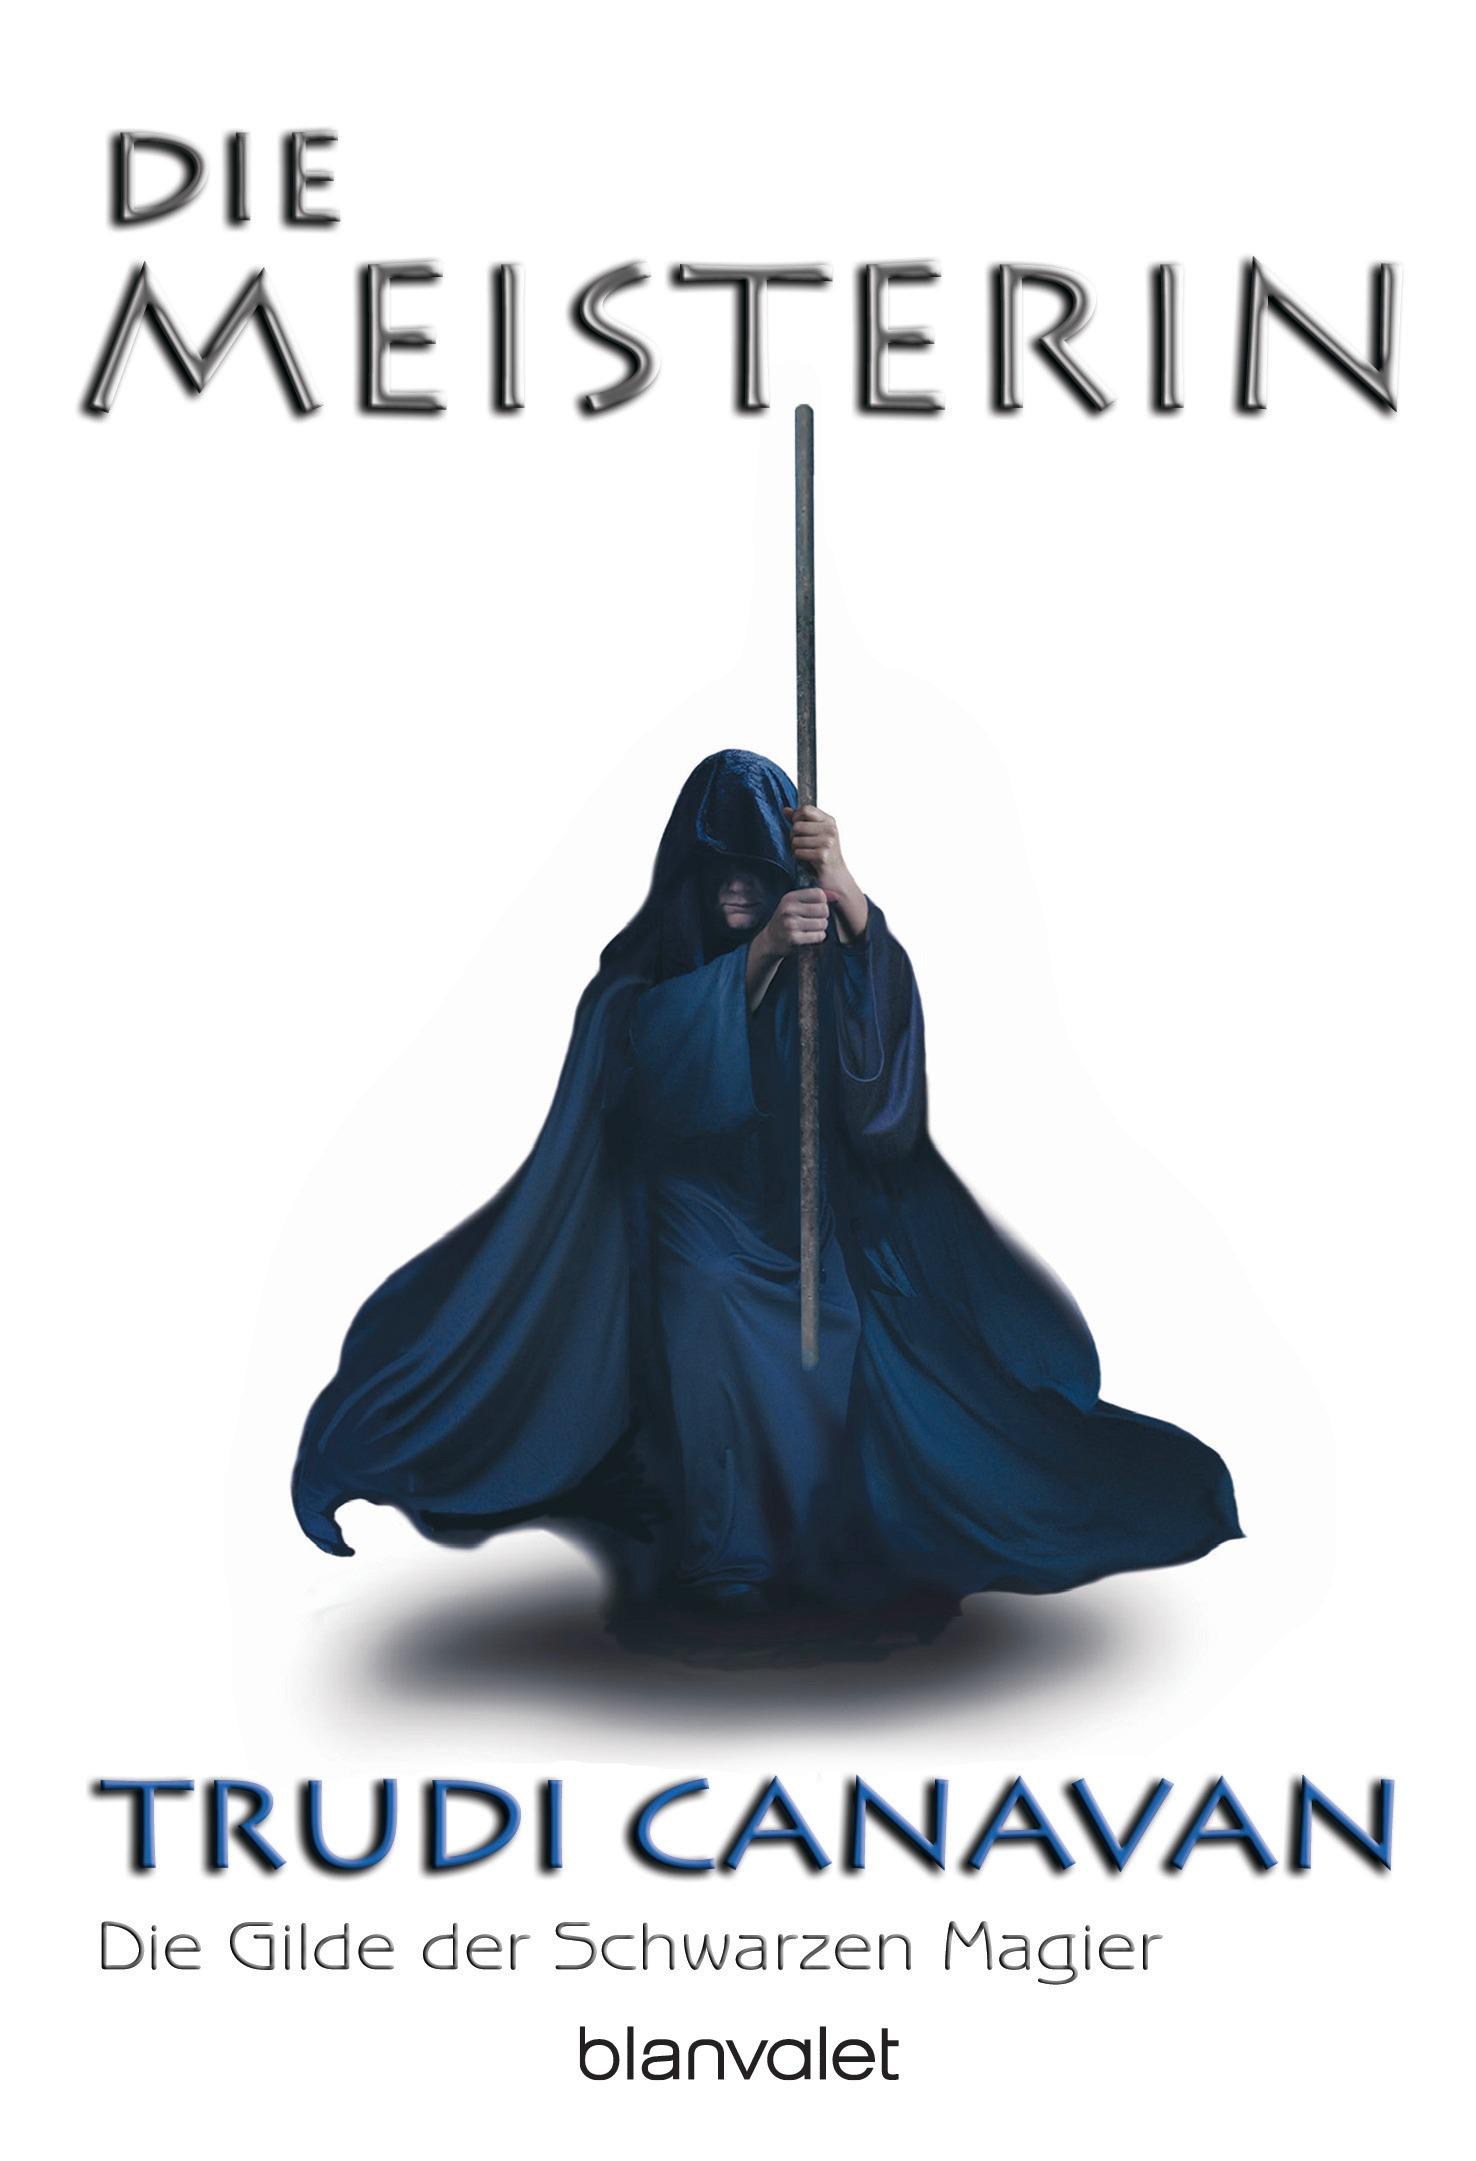 Die Meisterin. Die Gilde der Schwarzen Magier 03 - Trudi Canavan